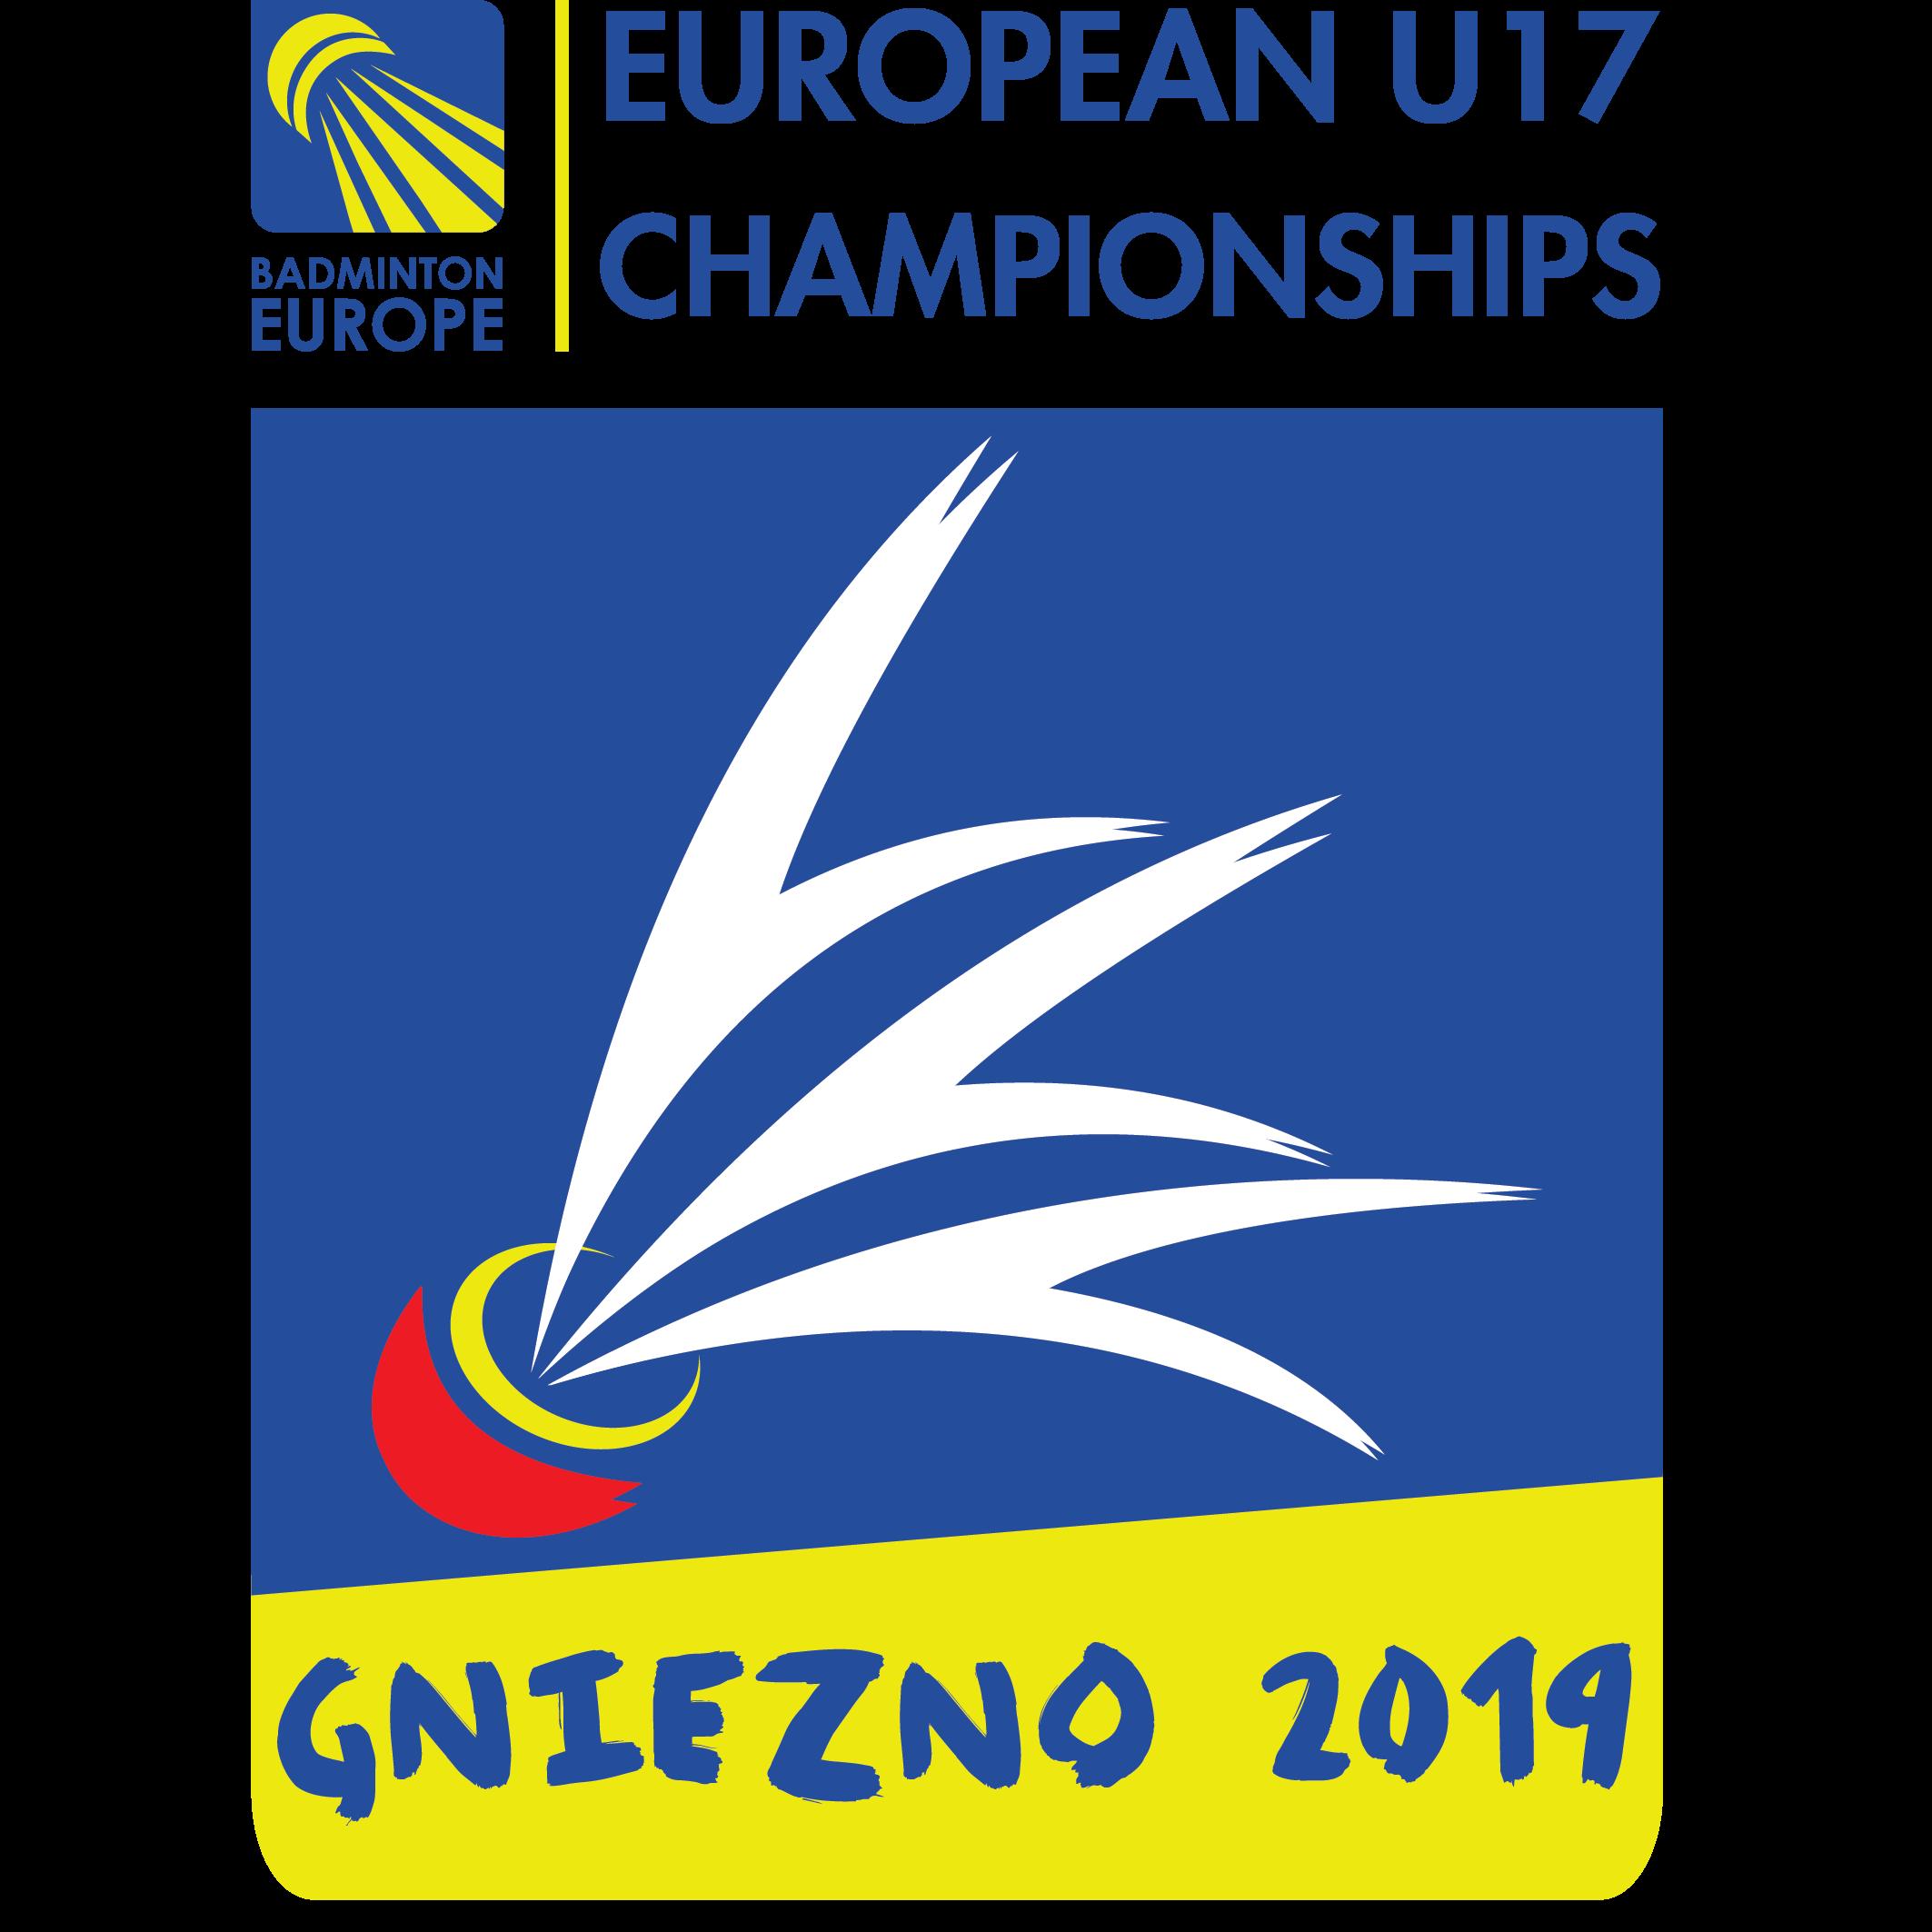 2019 European U17 Badminton Championships